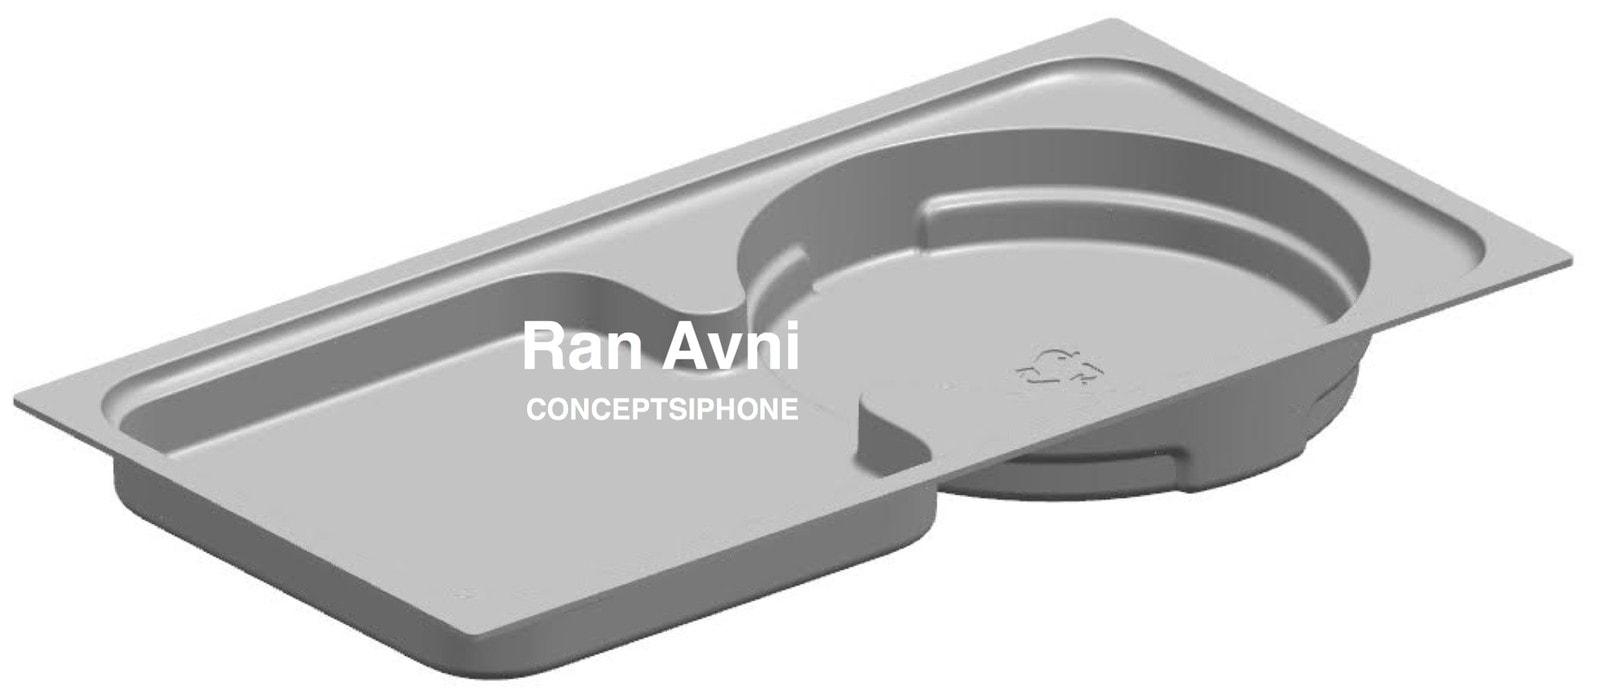 iPhone 12 Box Insert Render Concept